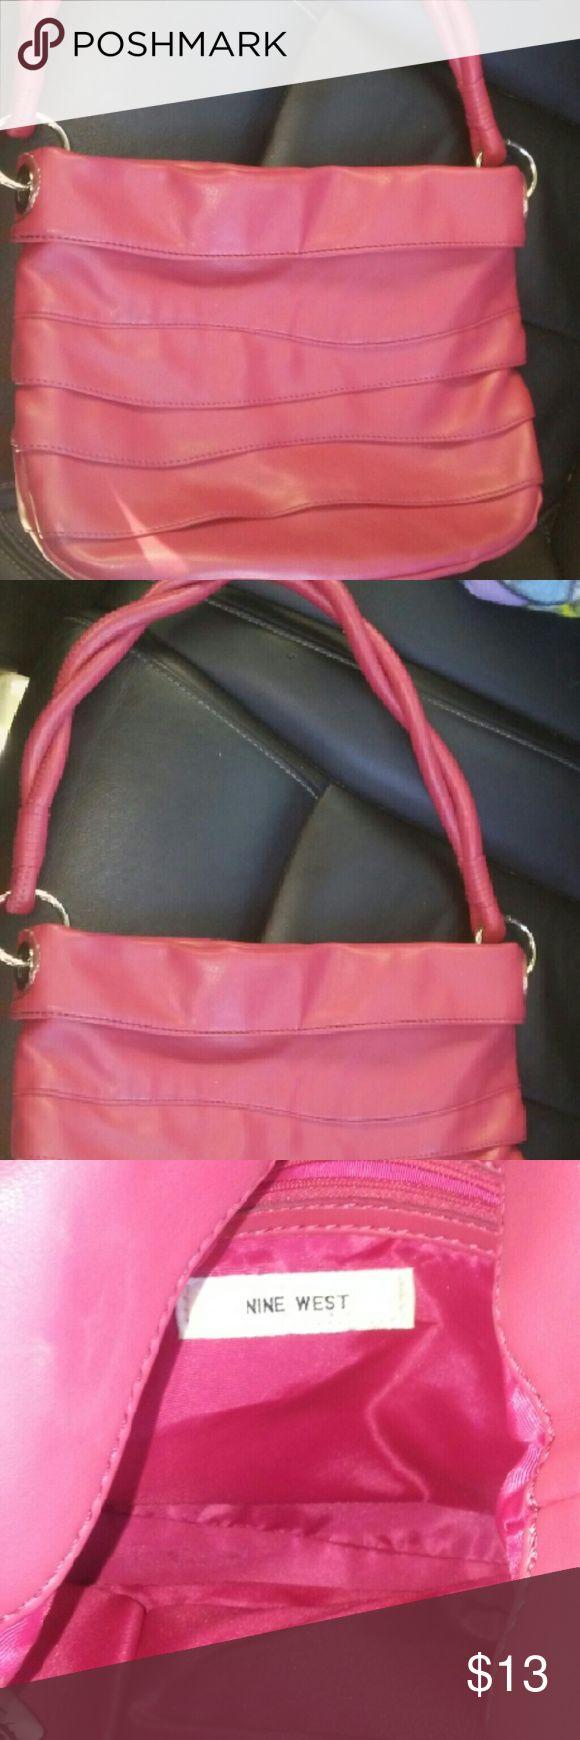 Nine west purse Beautiful, nine west purse, EUC Bags